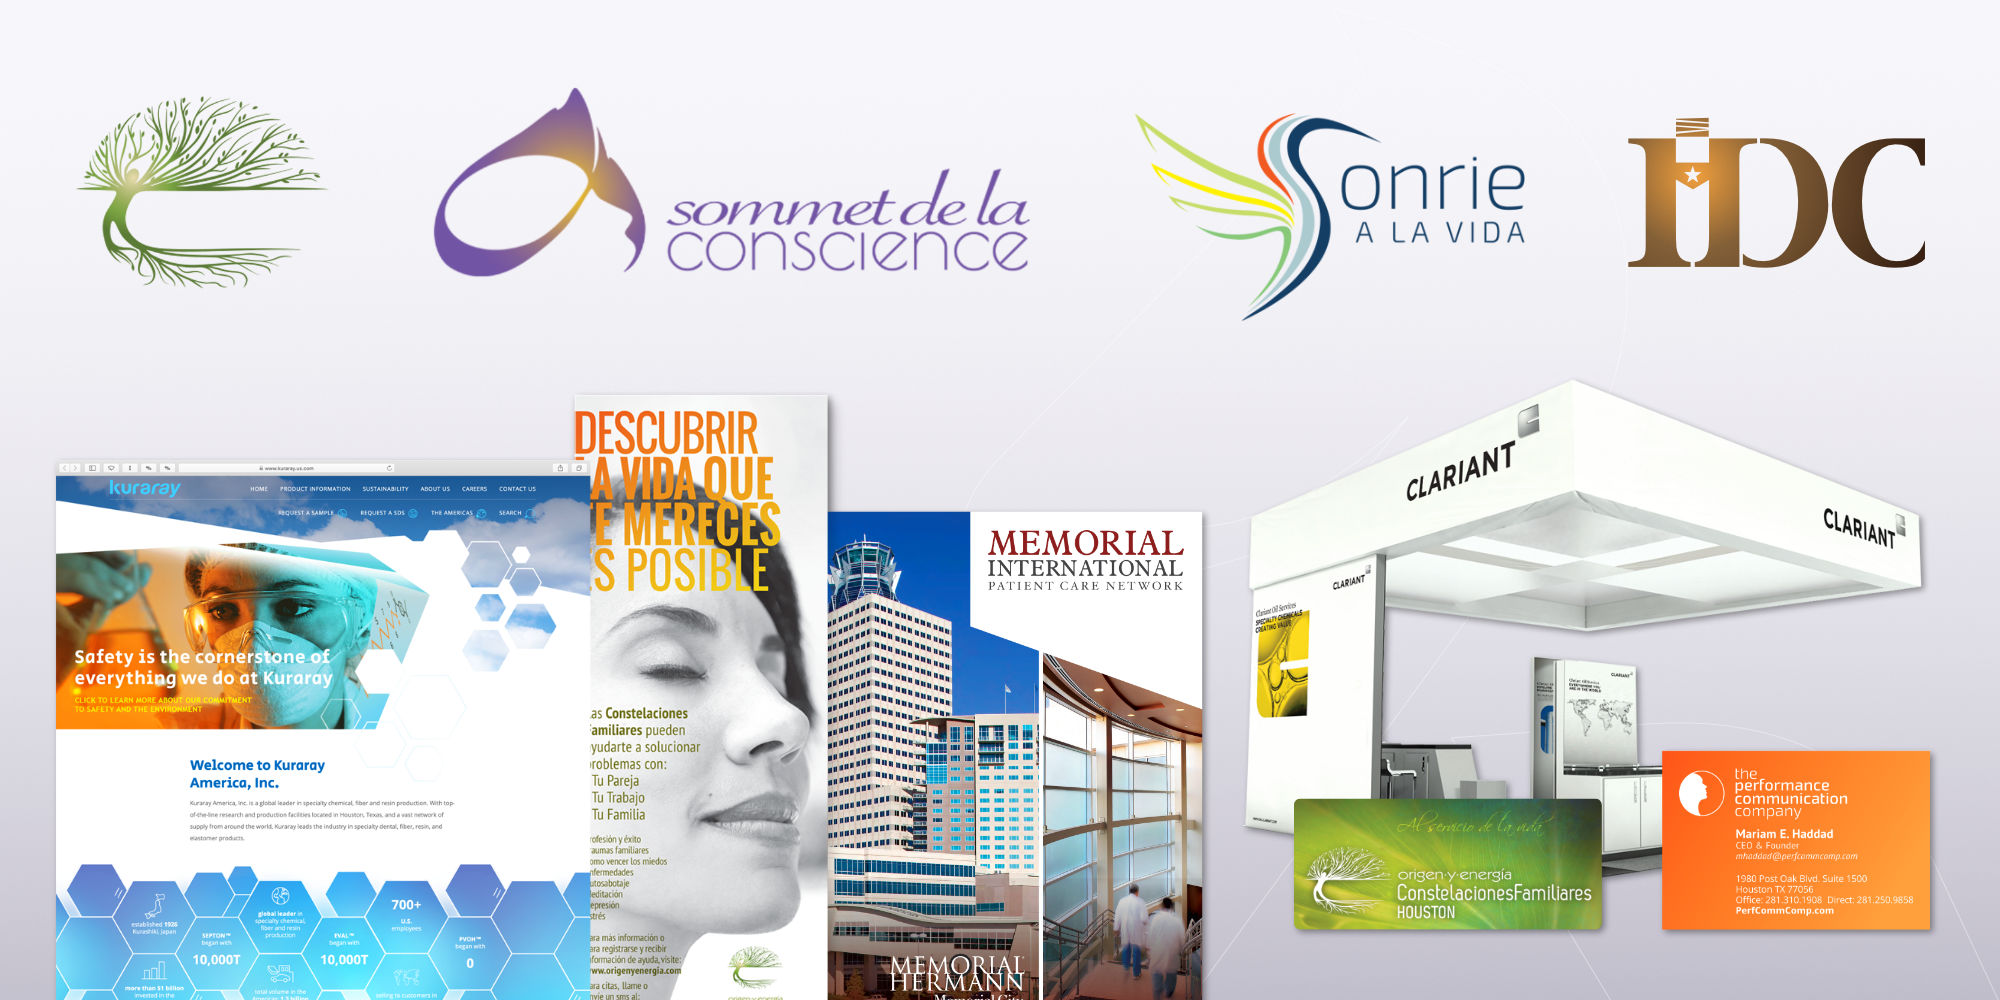 Graphic and web design by creative studio Hakubashi